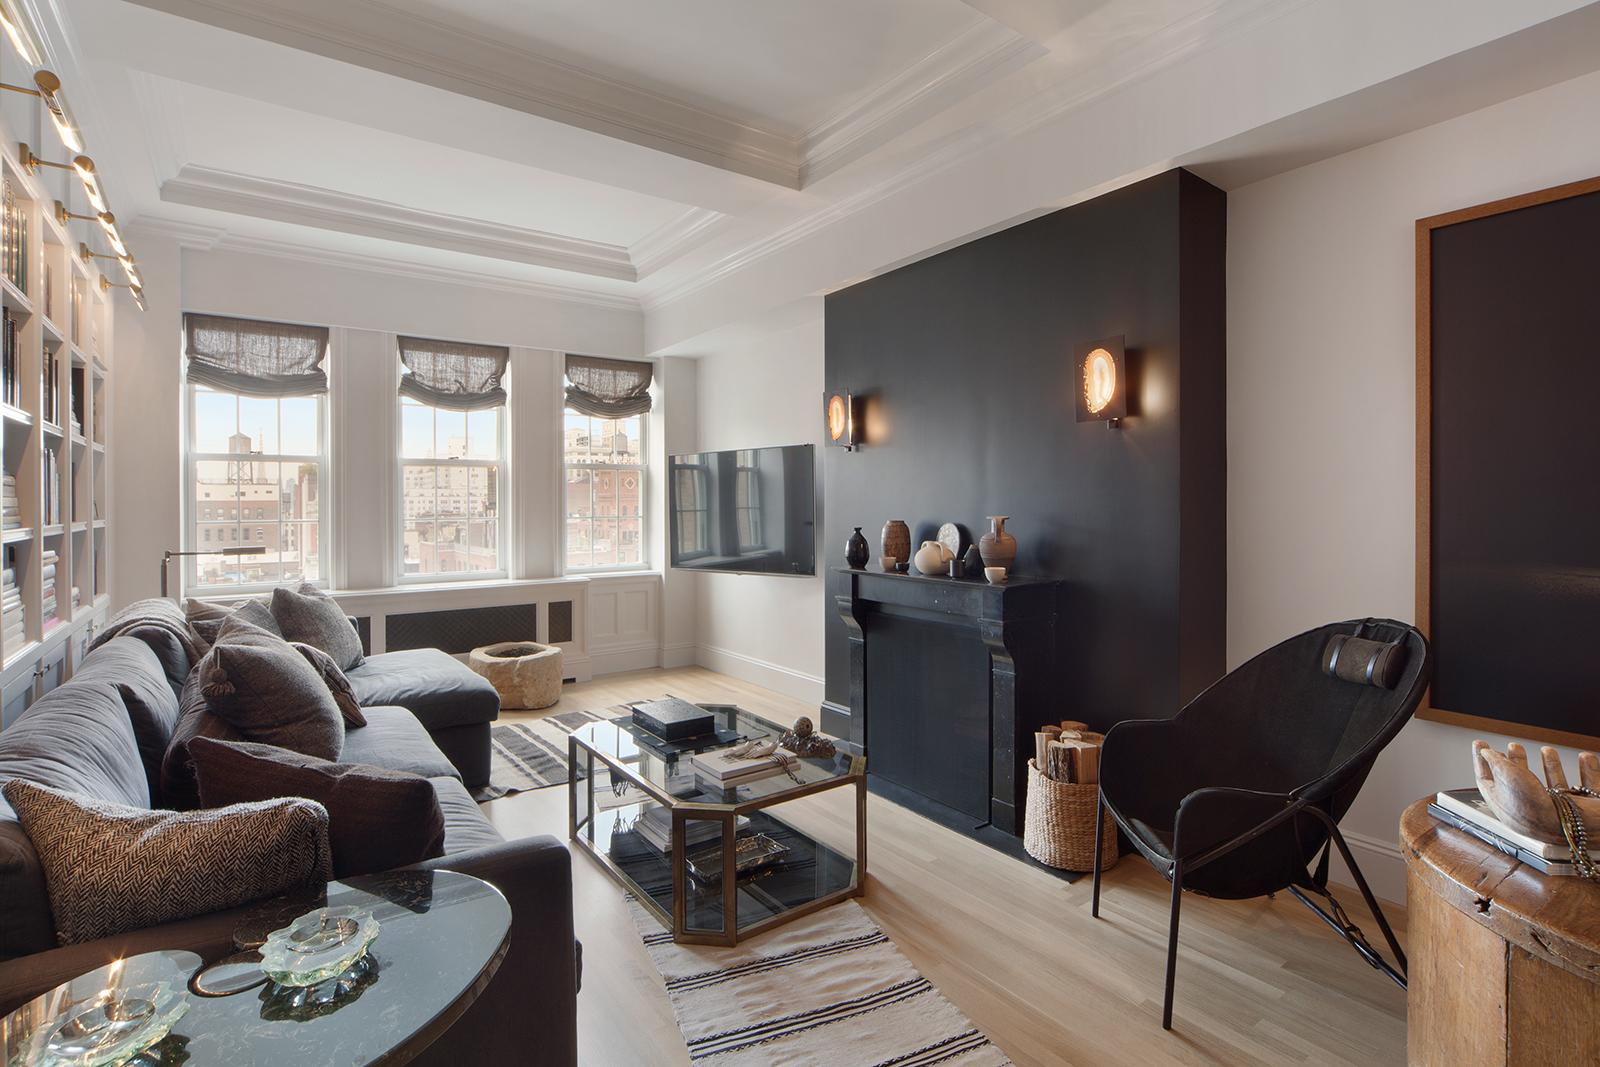 Nate Berkus Living Room Sold Designers Nate Berkus And Jeremiah Brent Sell Ph For List Ph